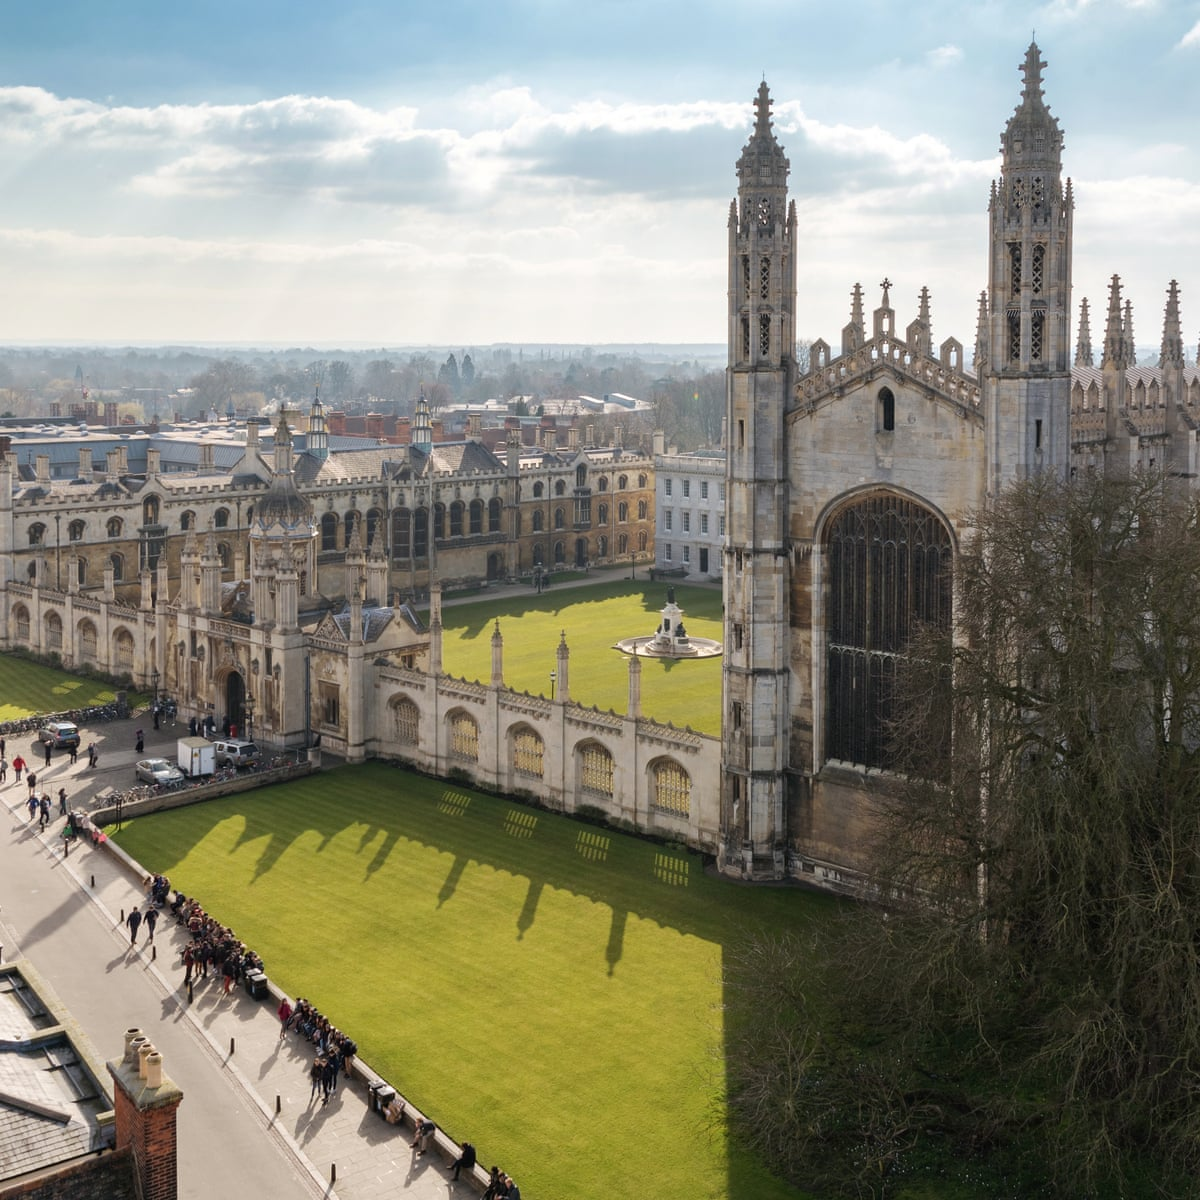 University guide 2022: University of Cambridge | University guide | The  Guardian